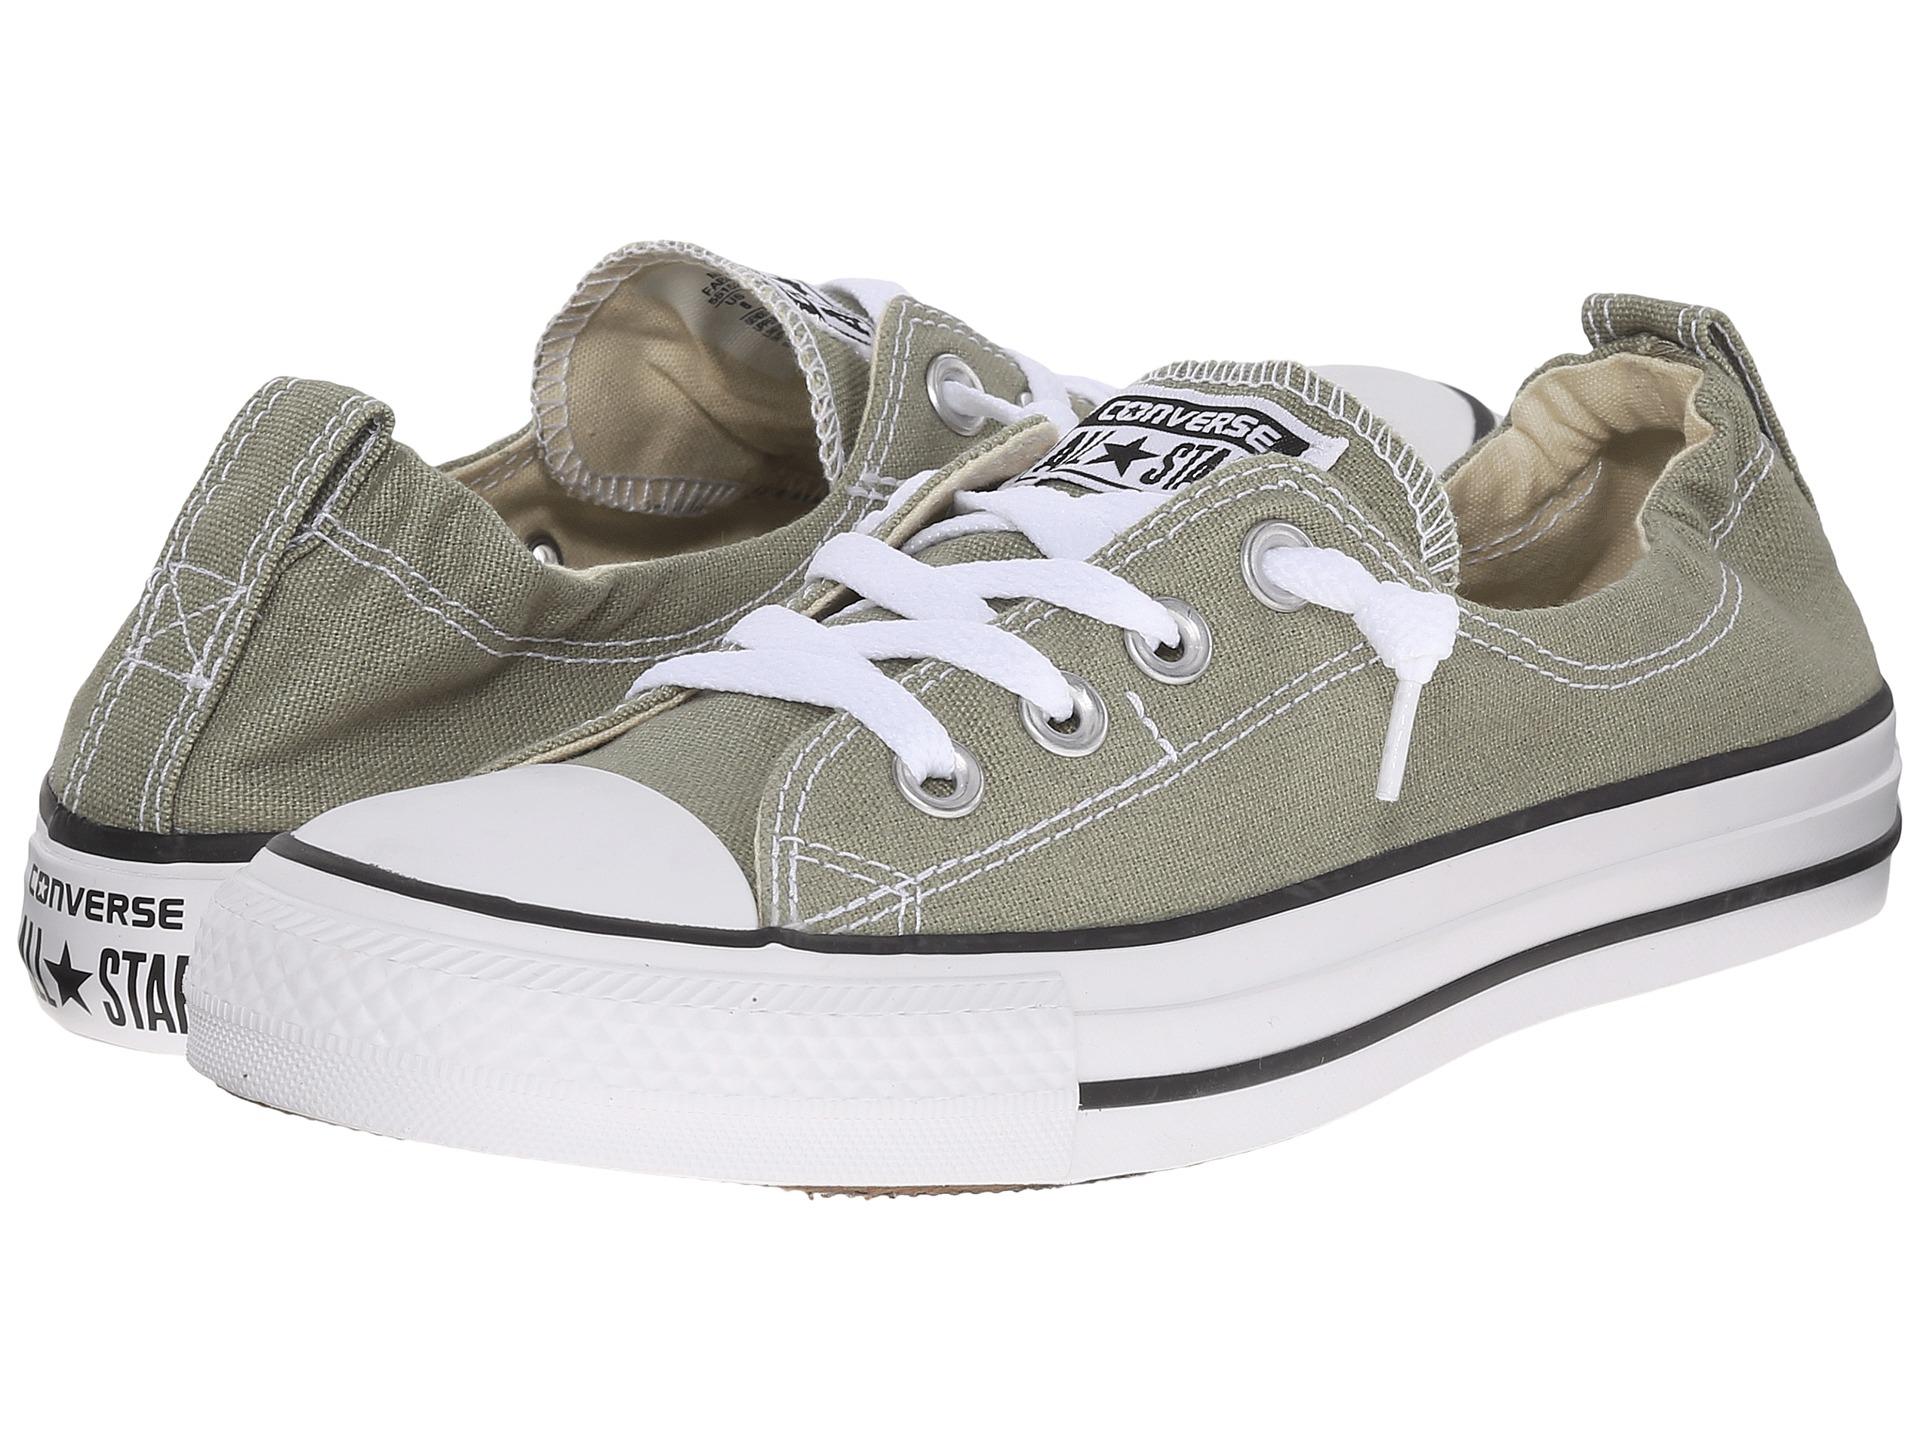 a777086e81e3 ... coupon for lyst converse chuck taylor all star fashion basics shoreline  in cc5a6 35190